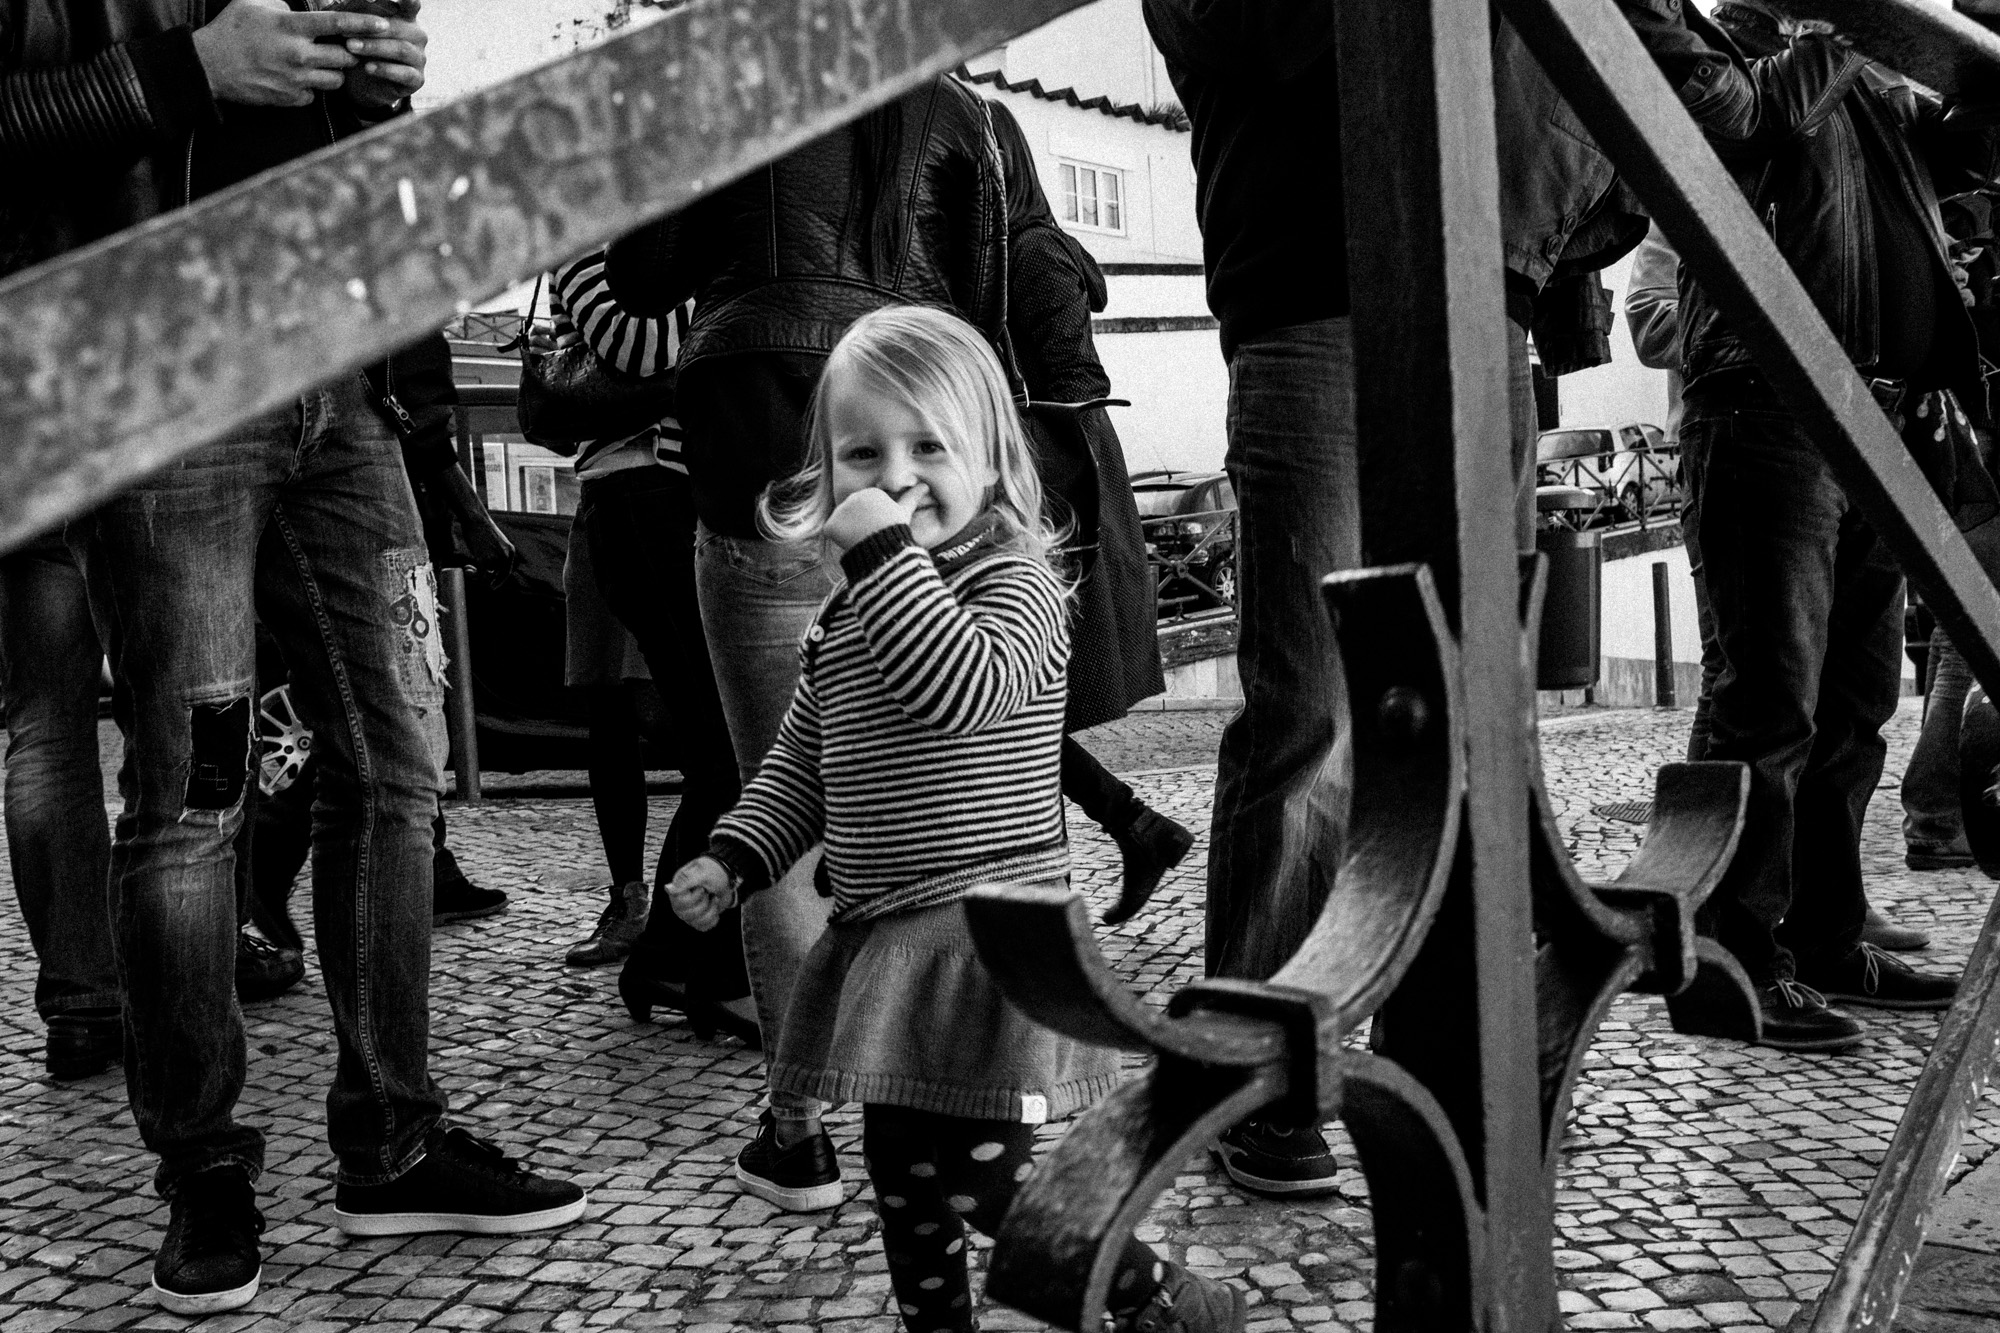 streets-of-lisbon-20.jpg